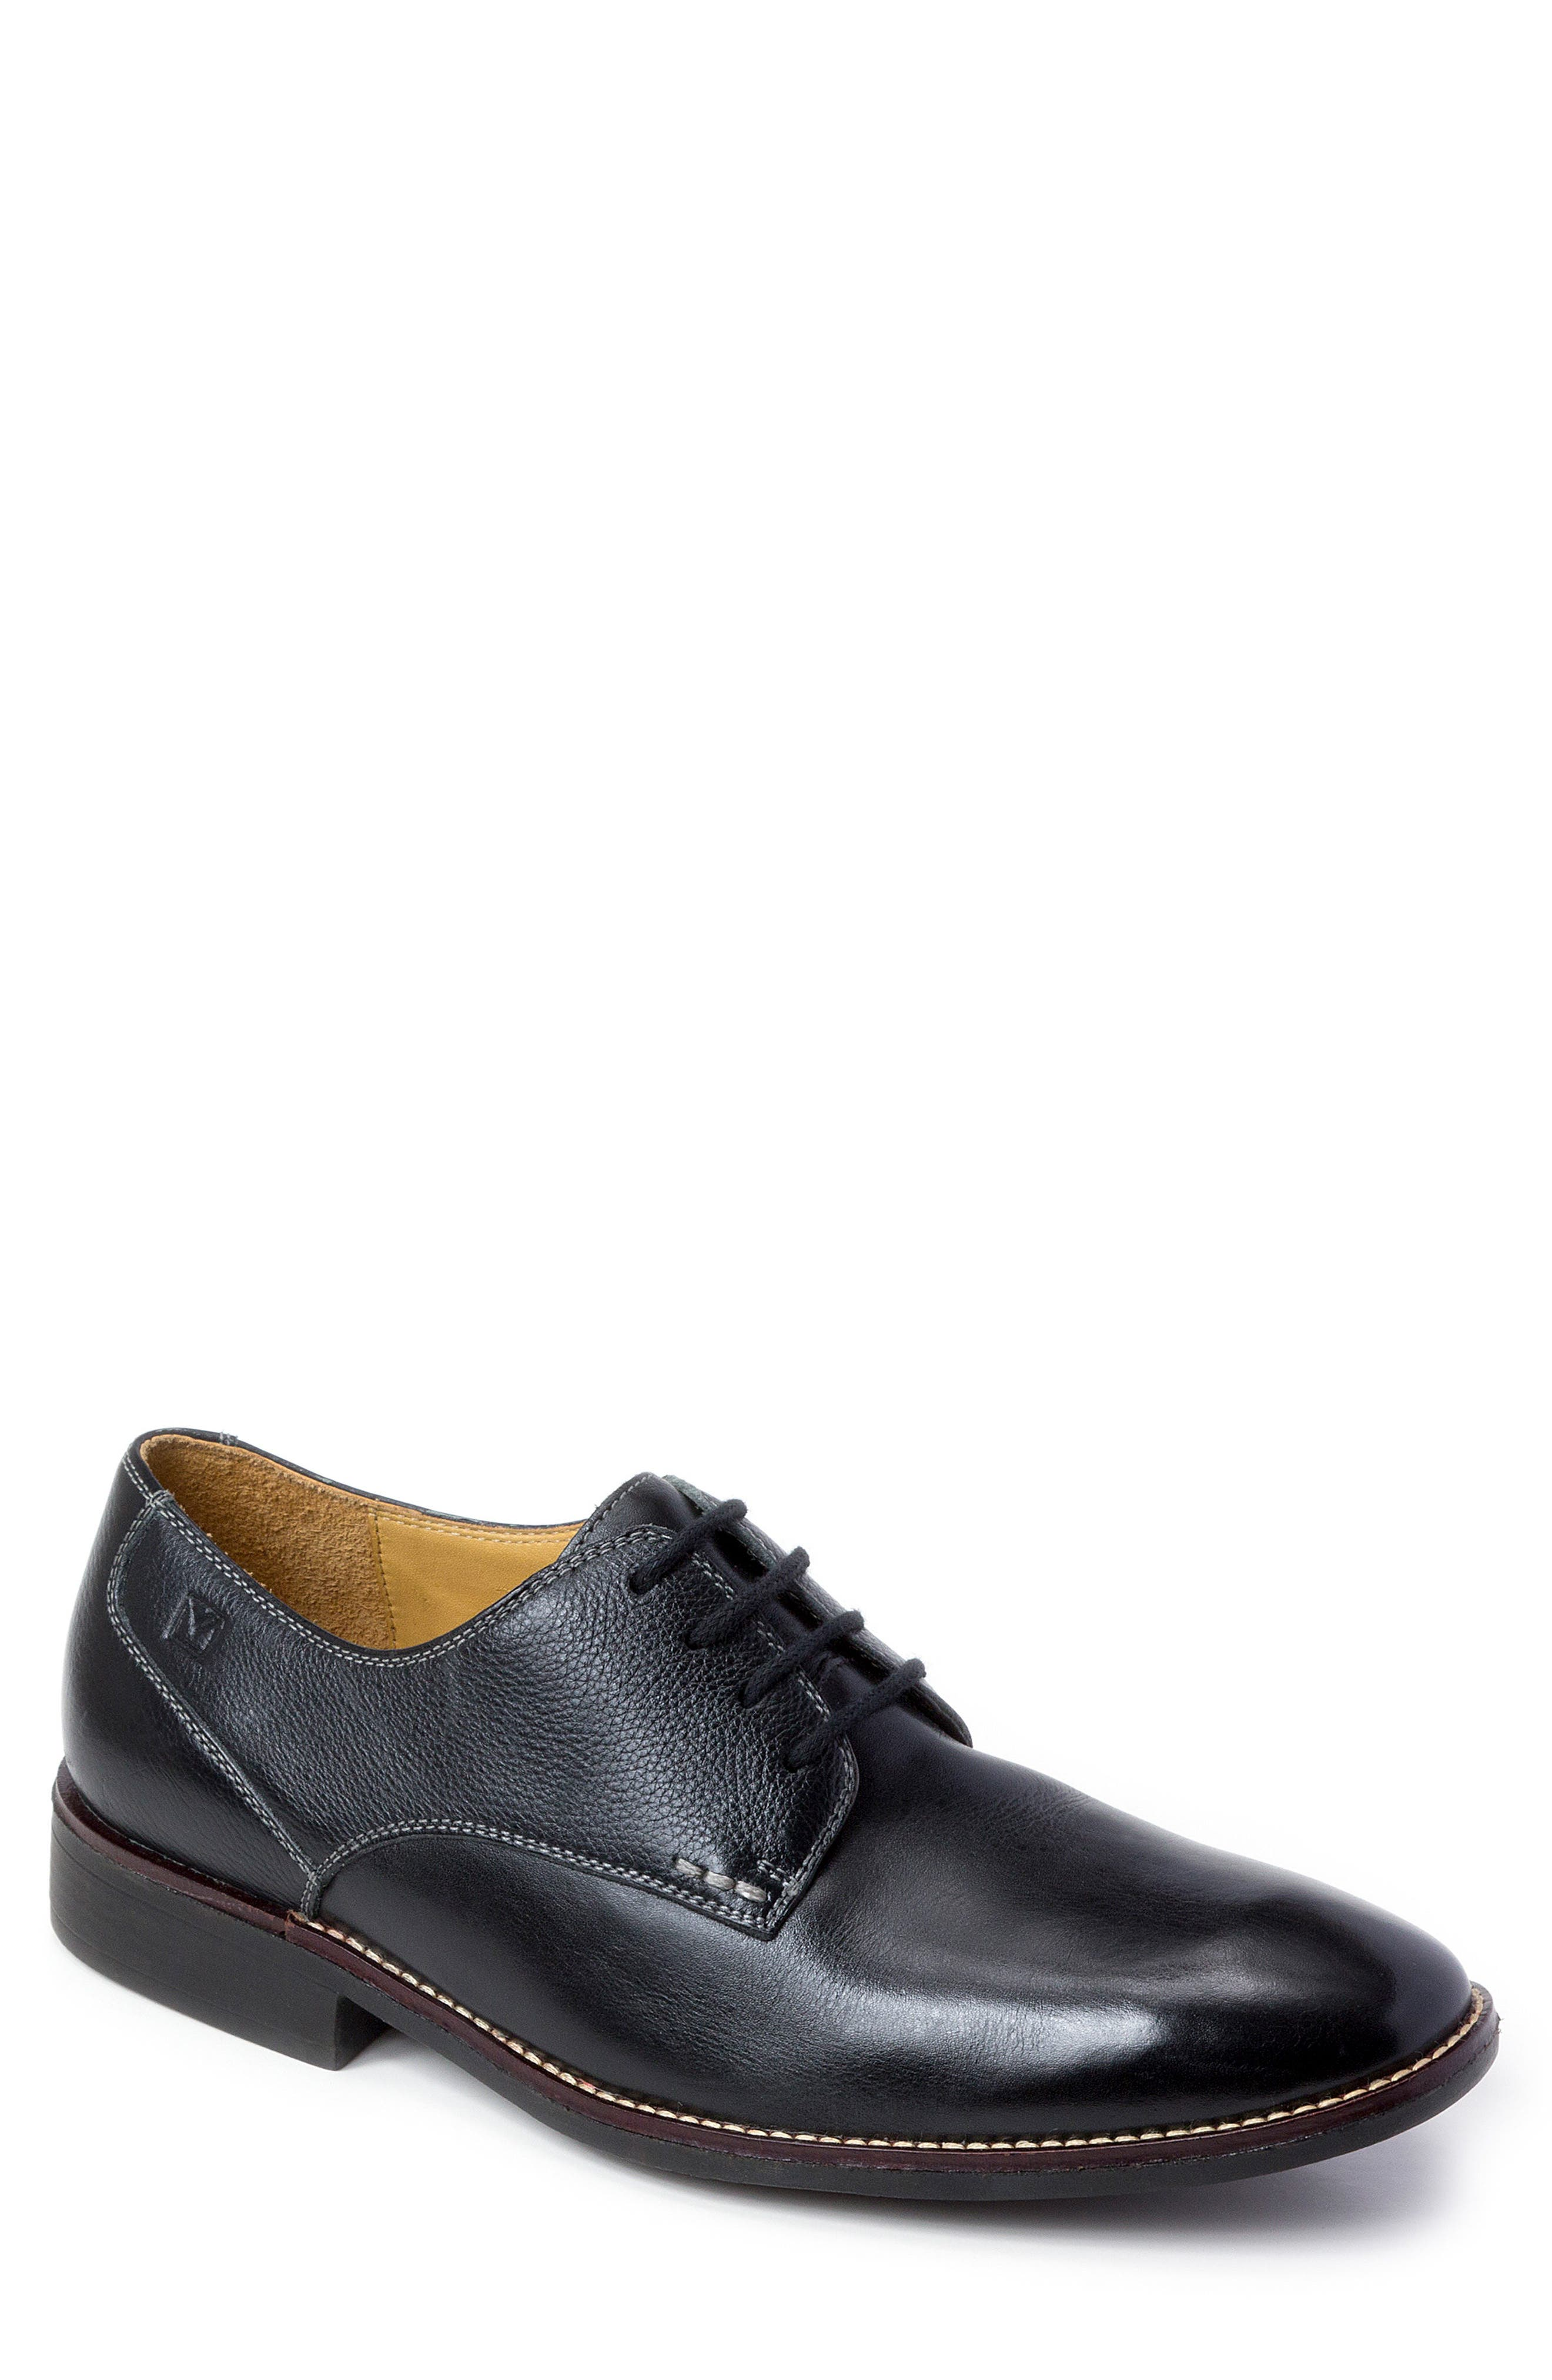 'Olsen' Plain Toe Derby,                             Main thumbnail 1, color,                             Black Leather